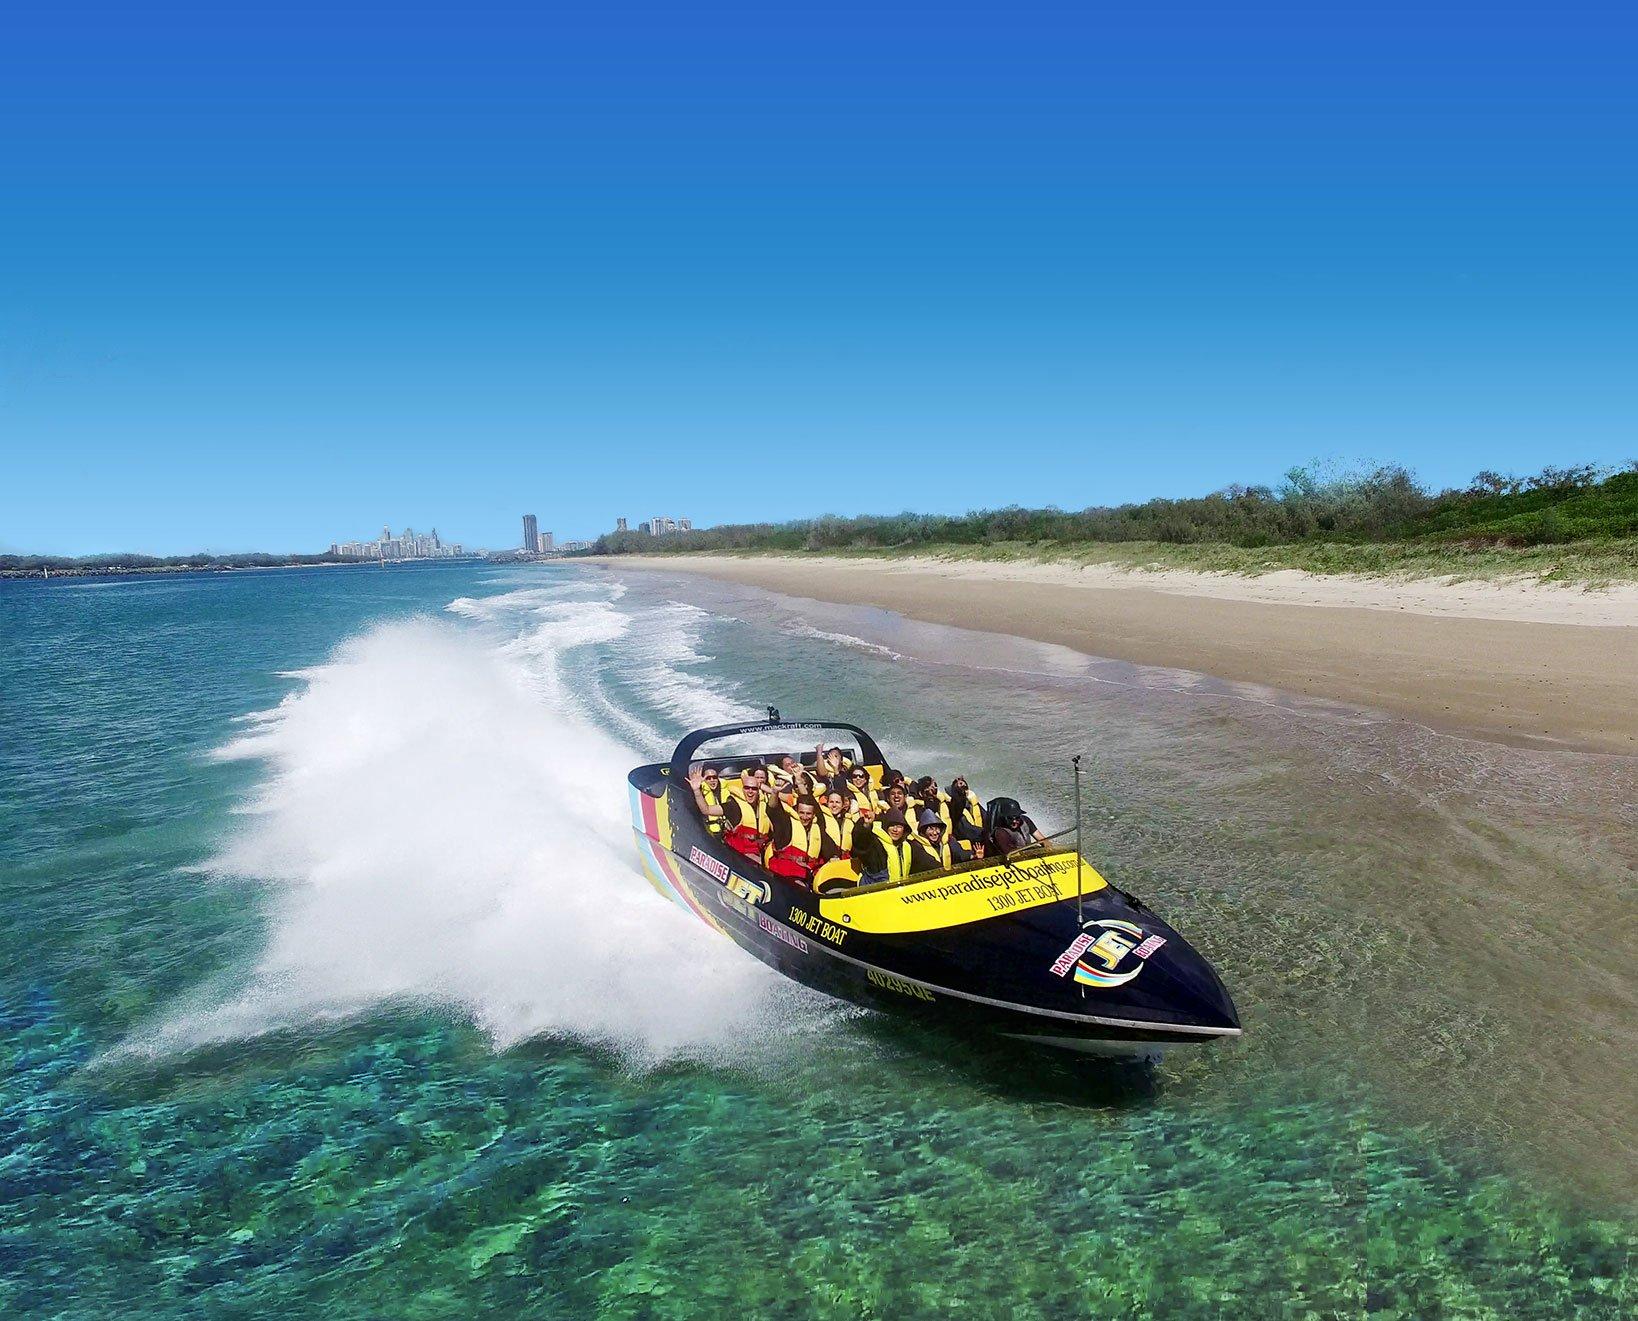 black jetboat cruising across the water